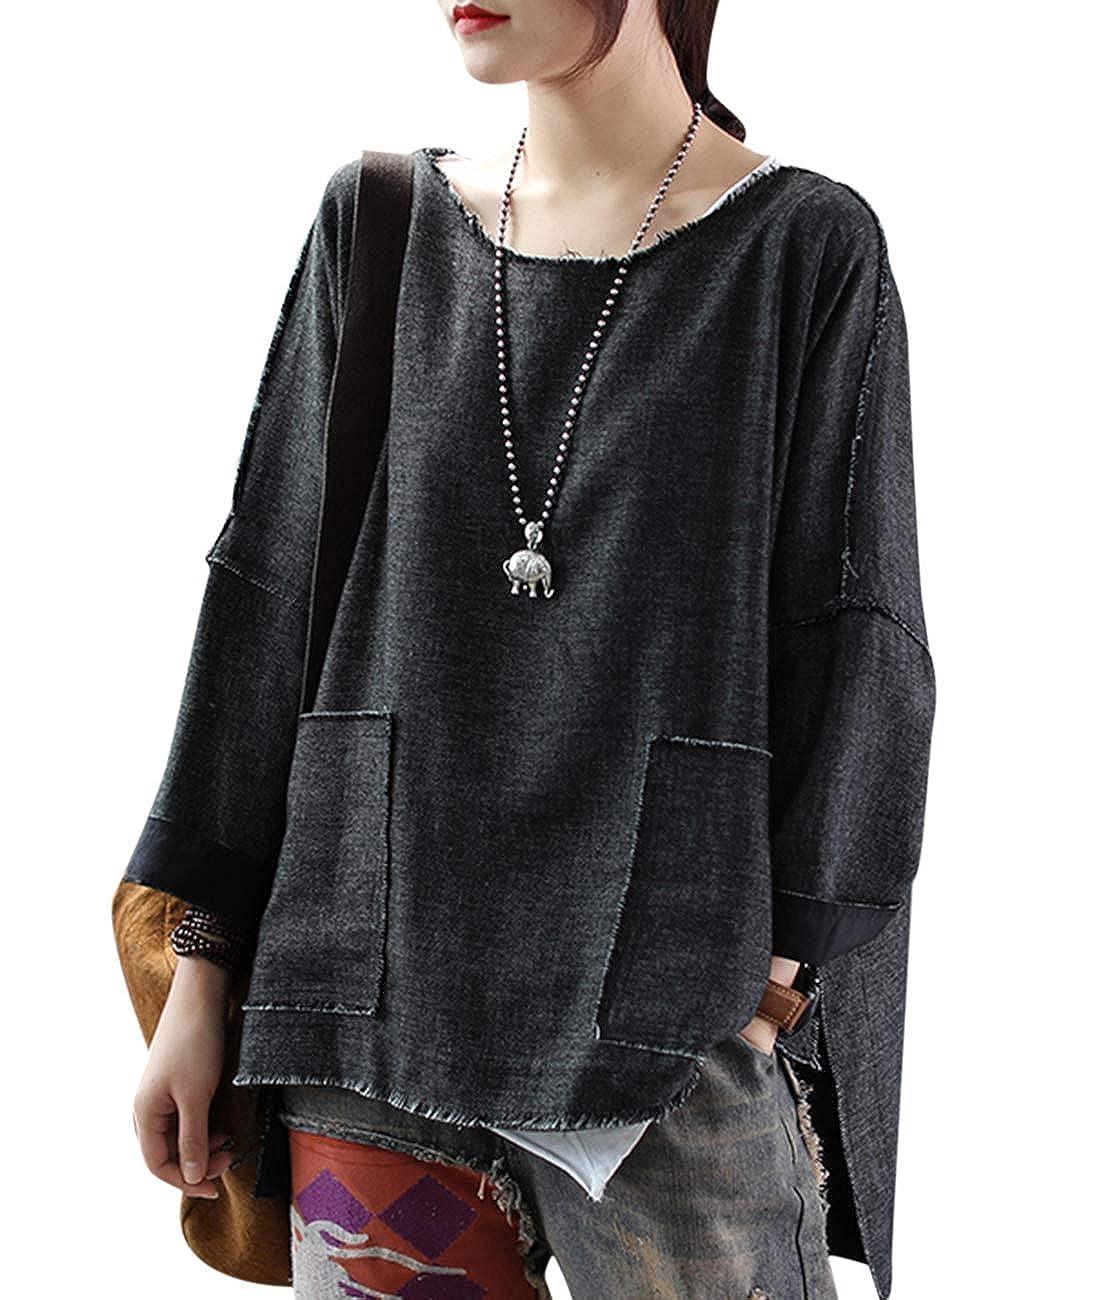 Black YESNO TH2 Women ButtonDown Loose Tops Blouse Shirt Casual Plus Size 100% Linen Big Chest Pocket 3 4 BatWing